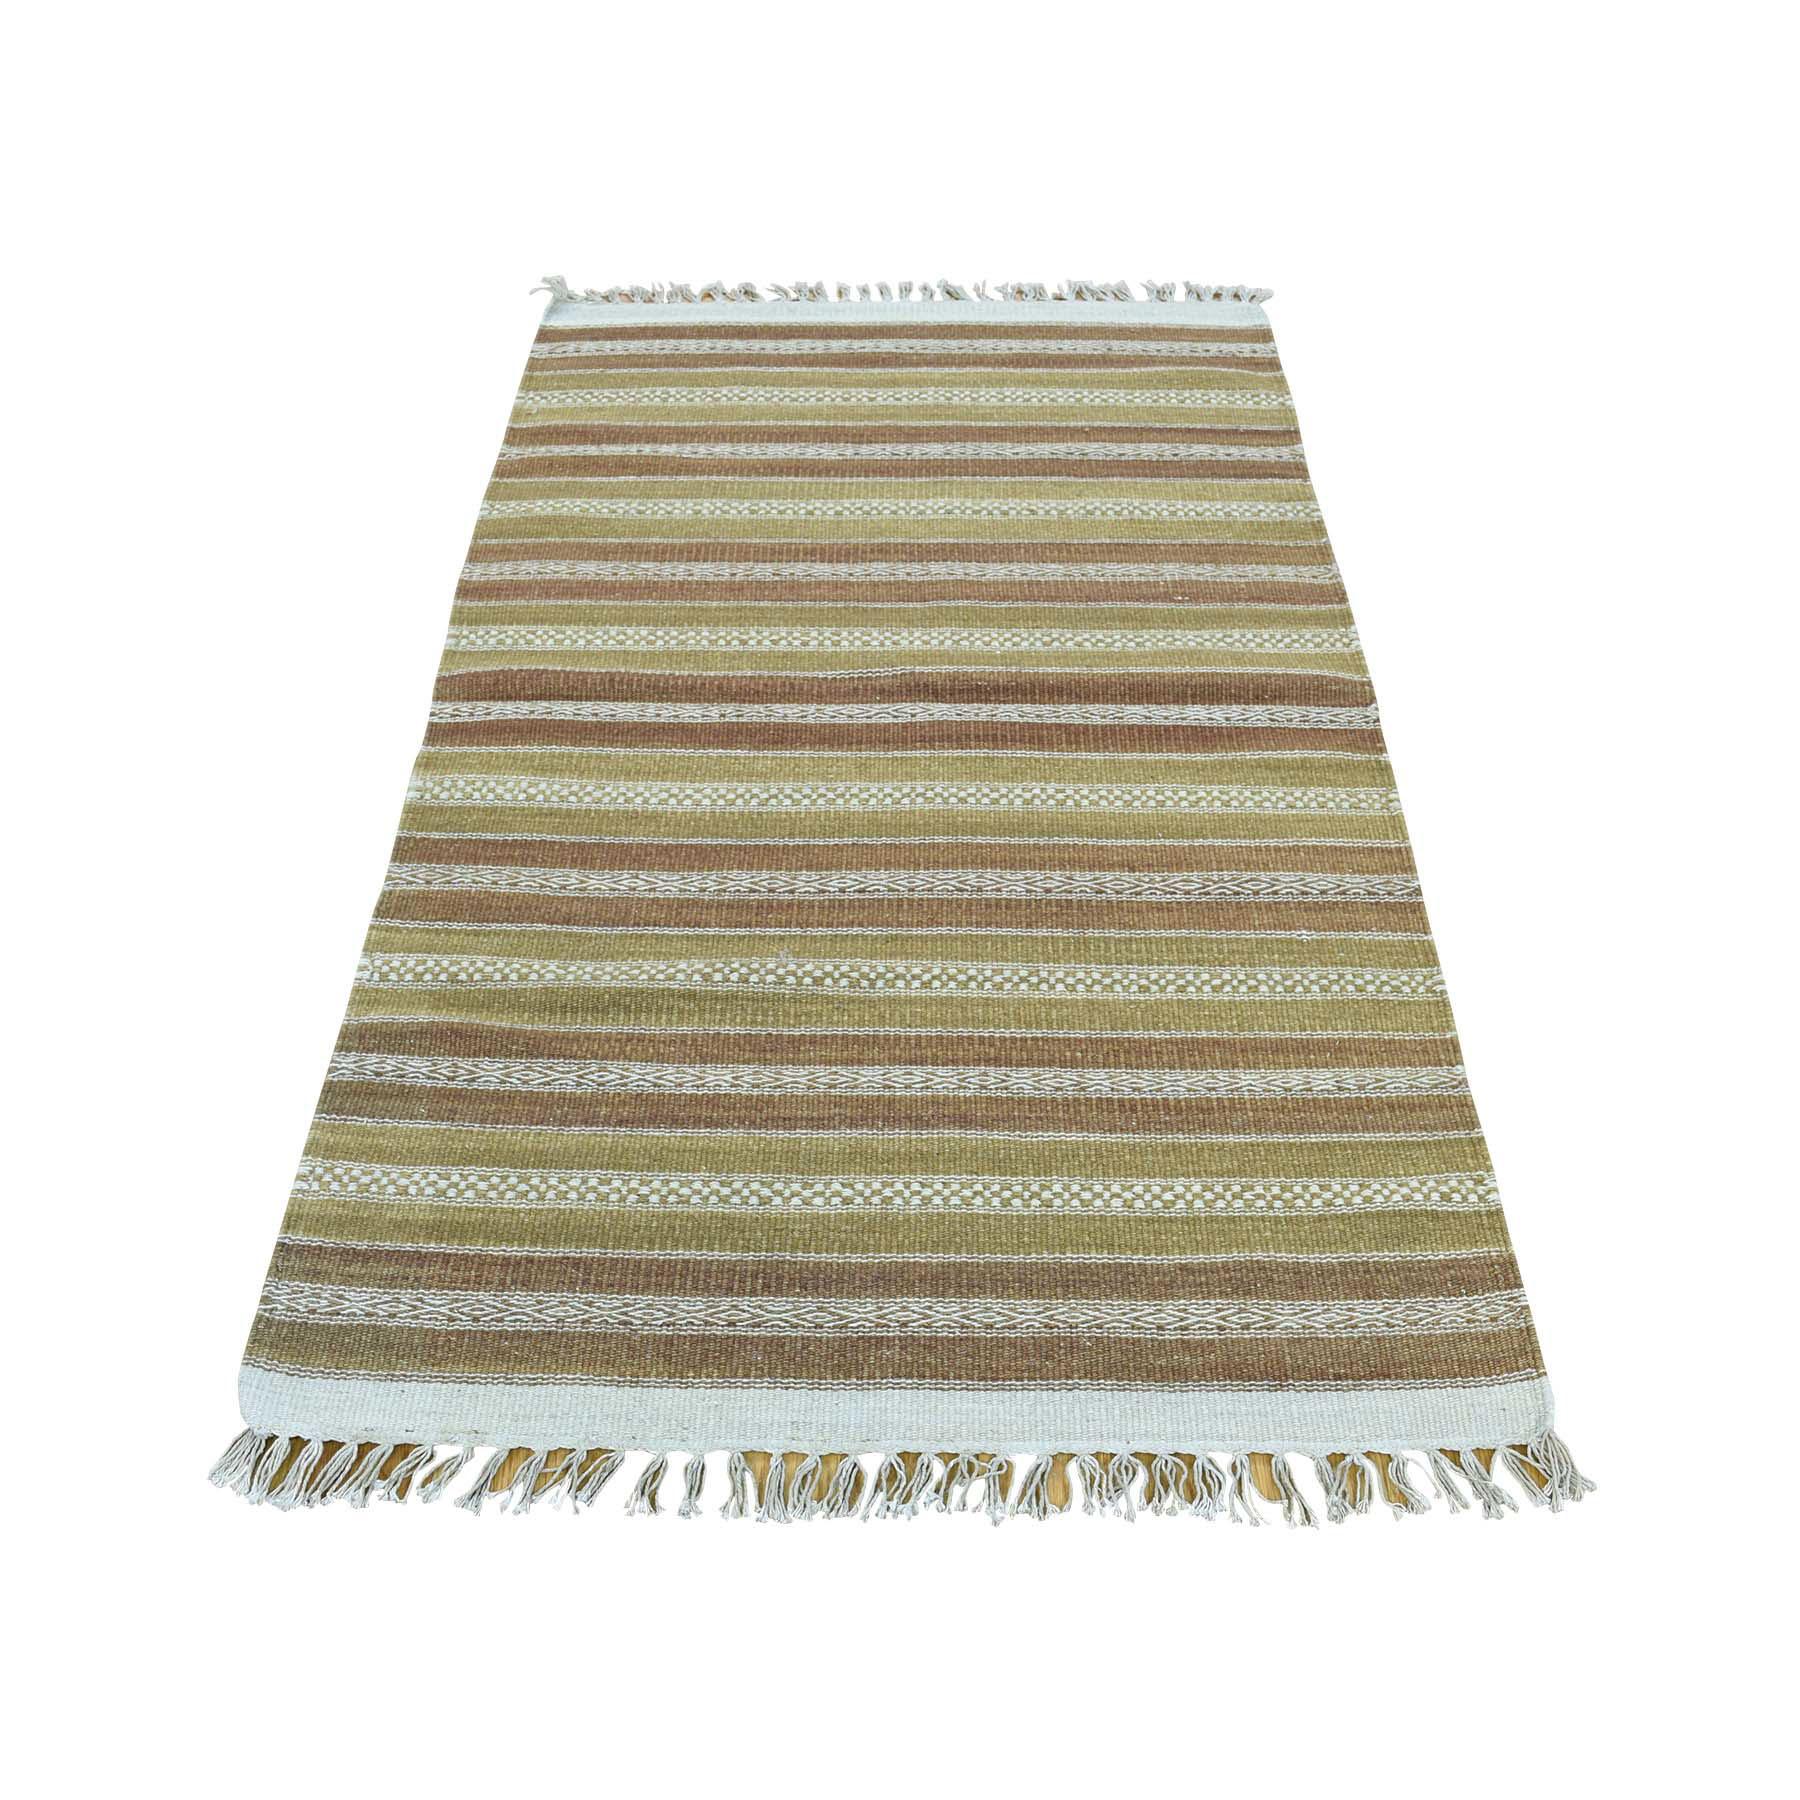 "2'9""X5'1"" Flat Weave Pure Wool Hand-Woven Reversible Striped Kilim Rug moaca86b"